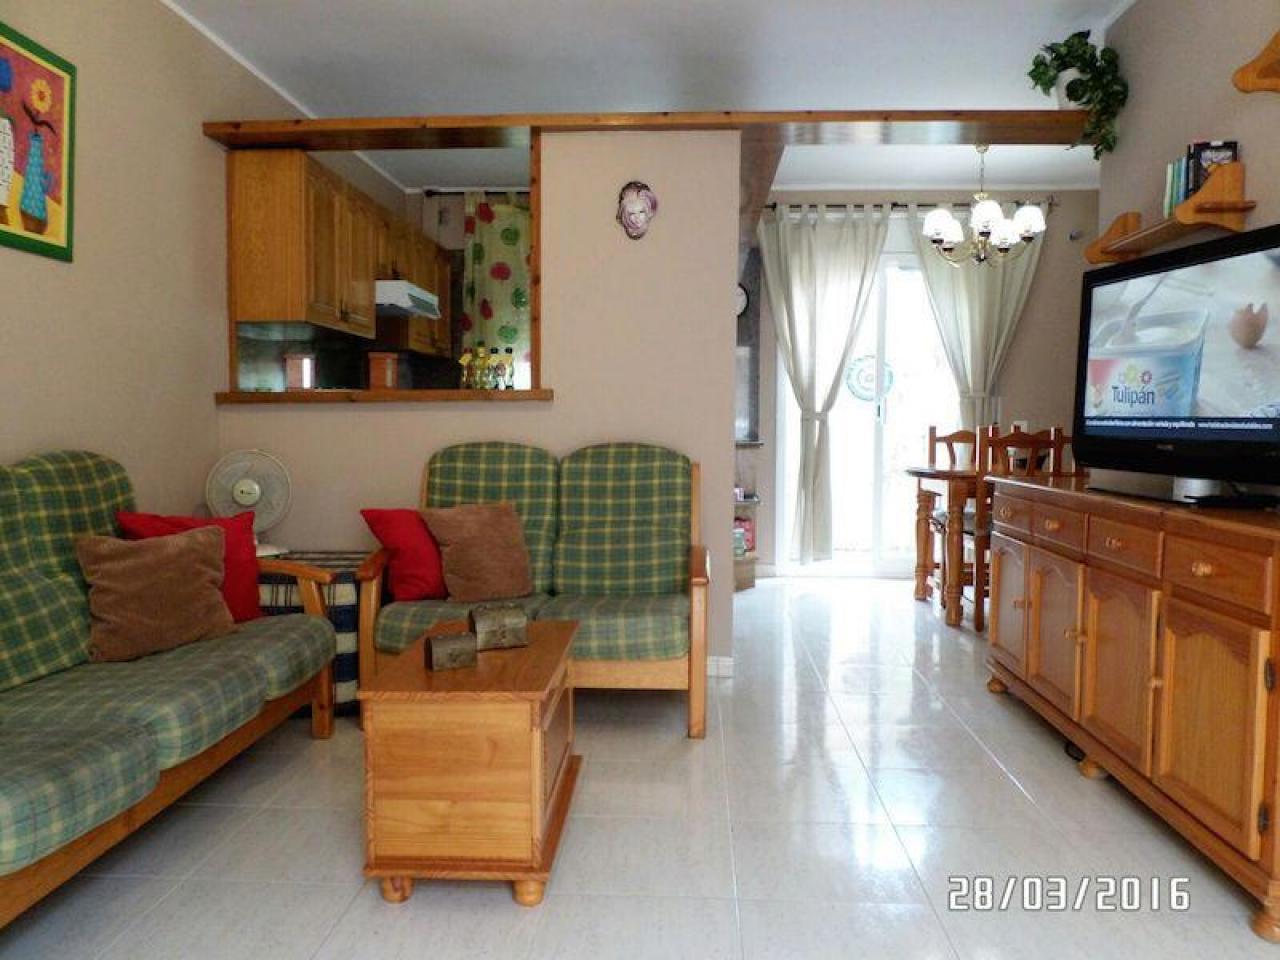 Alquiler de apartamentos Francàs, Tarragona